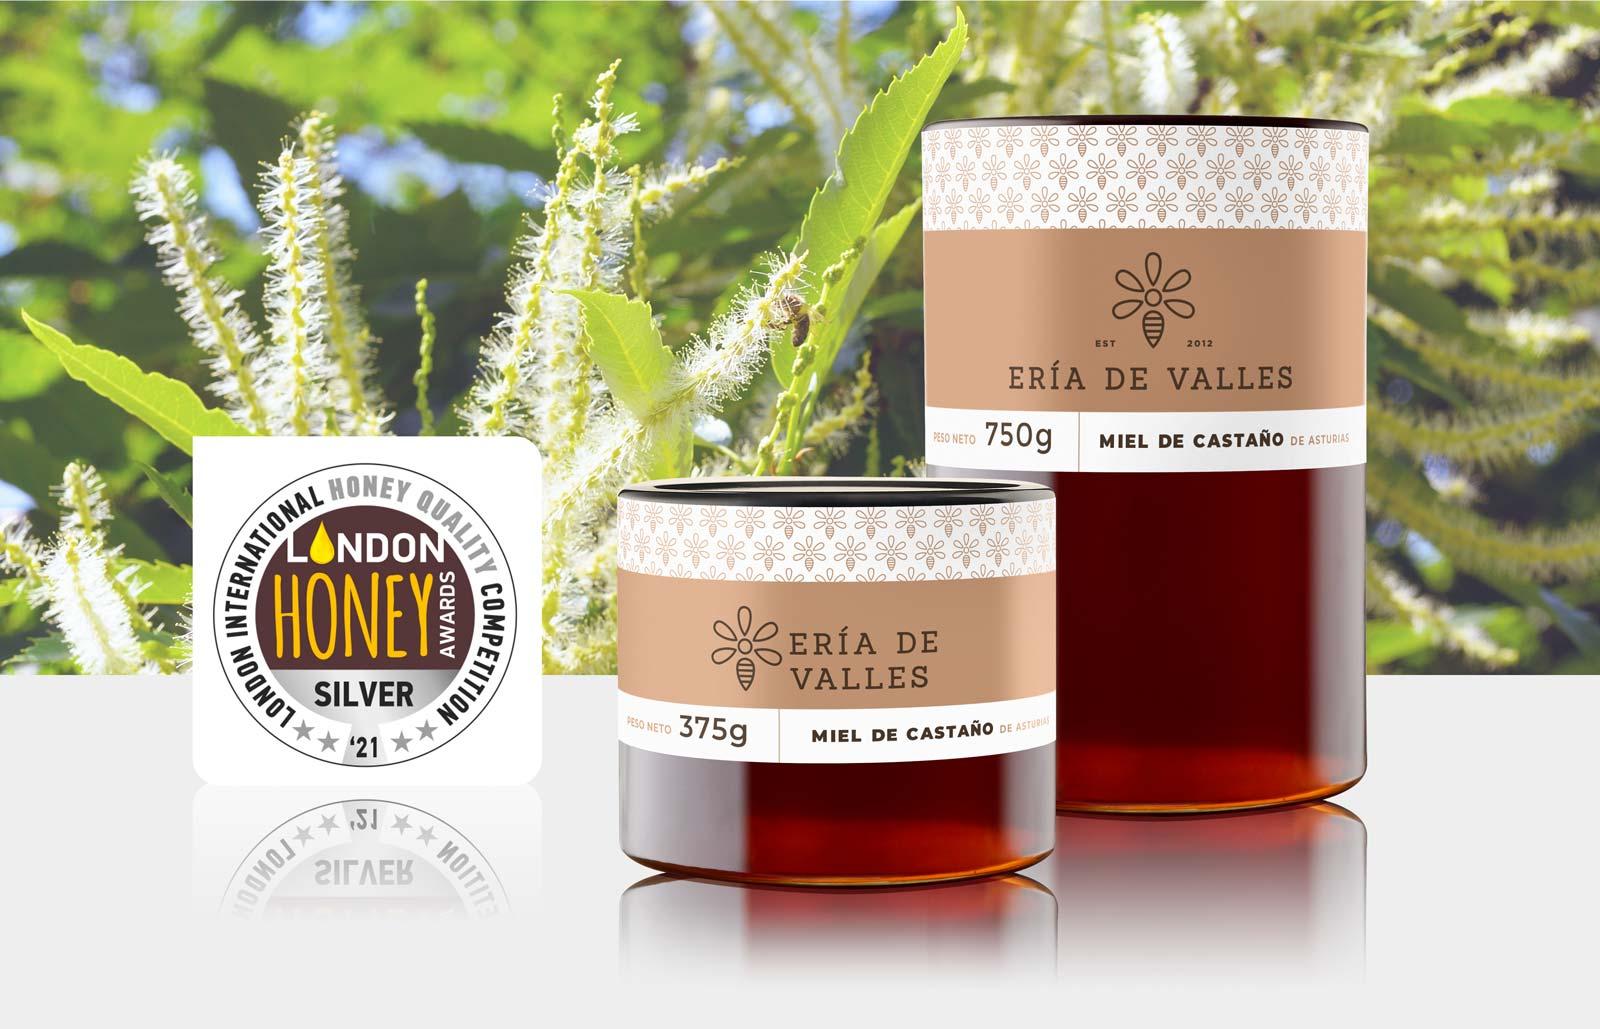 Medalla de Plata Miel de Castaño en el London International Honey Awards